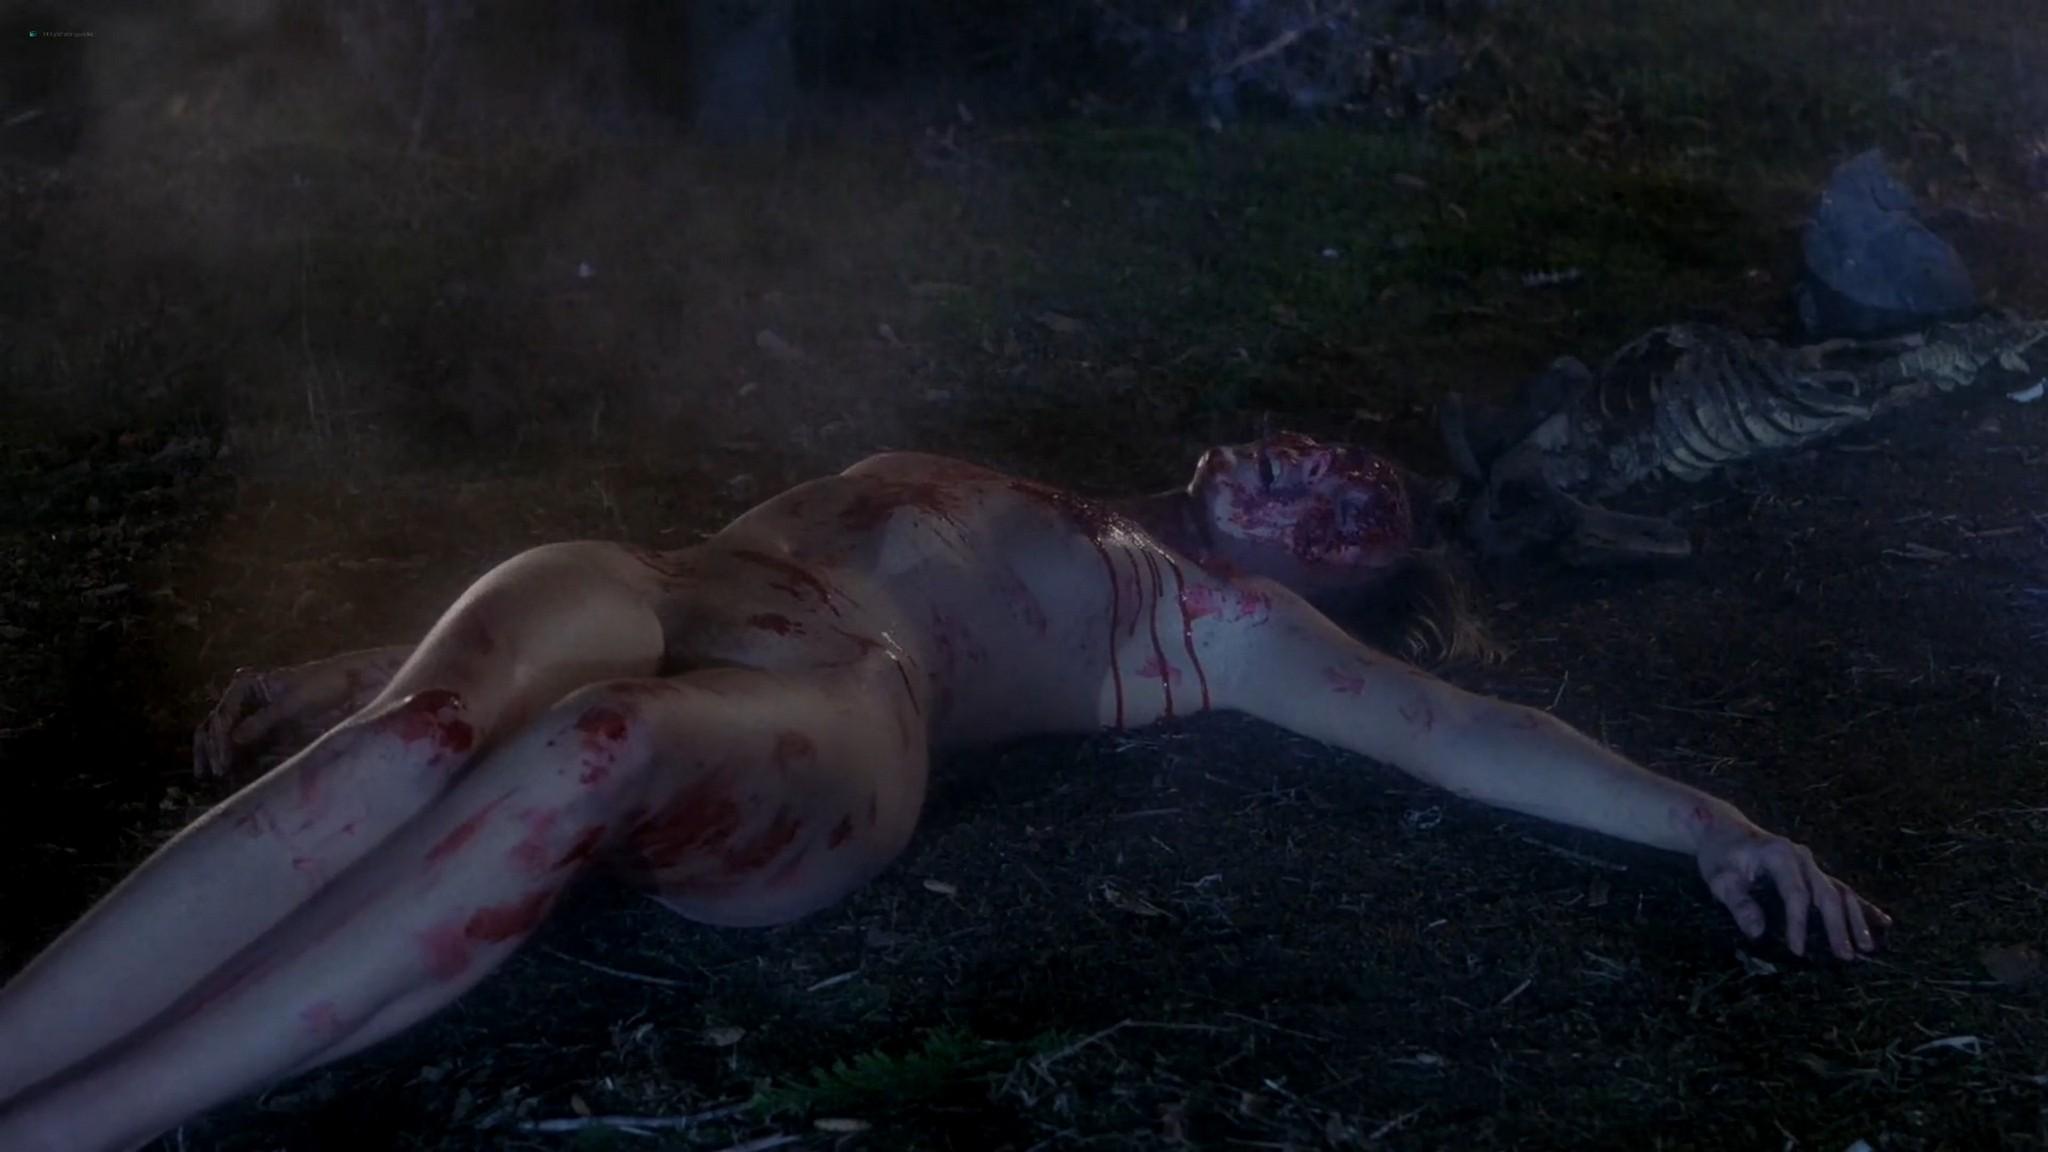 Carole Kirkham nude full frontal Silvia Miro Paquita Ondiviela all nude bush Panic Beats ES 1983 1080p BluRay 5